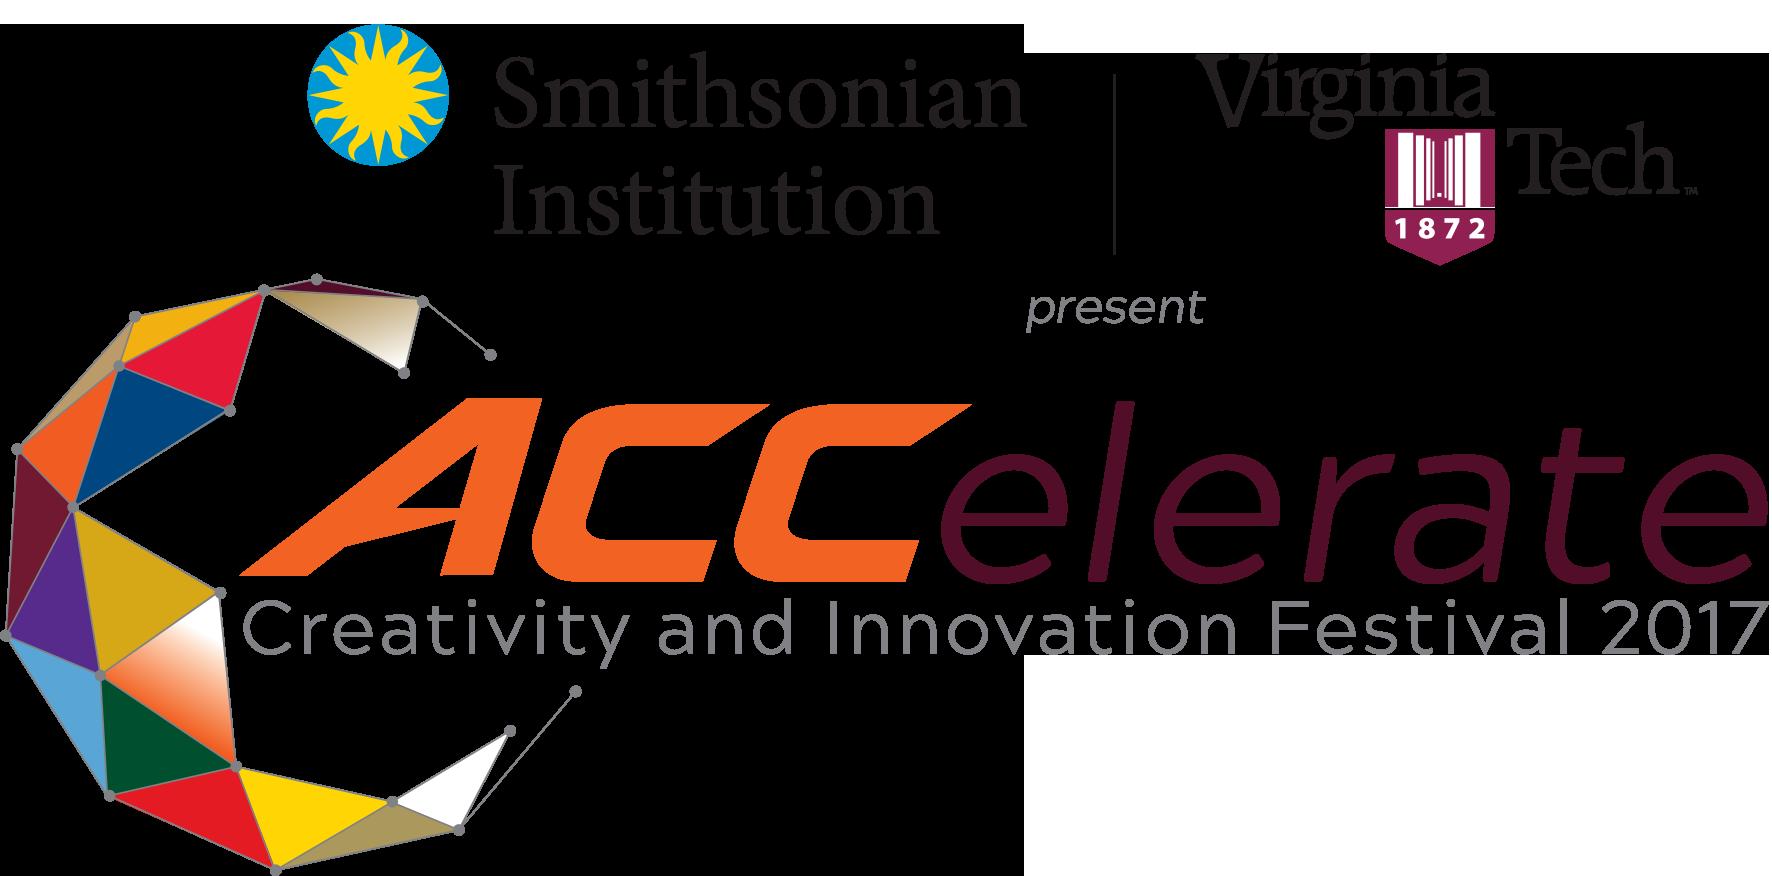 ACCelerate Festival logo